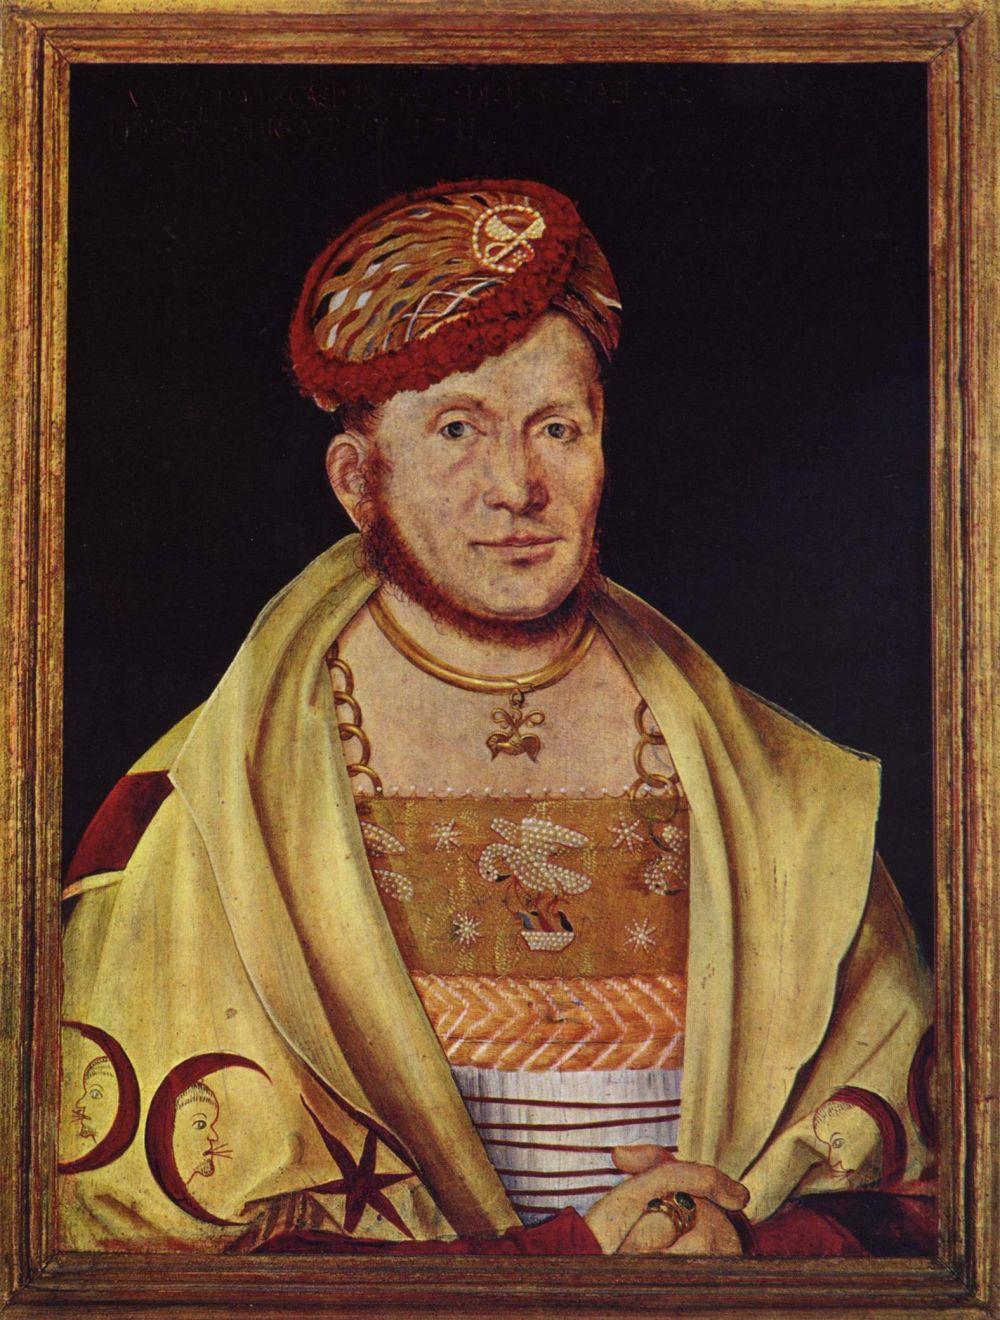 Hans Süs background Kulmbach. Portrait of the Margrave Casimir of Brandenburg